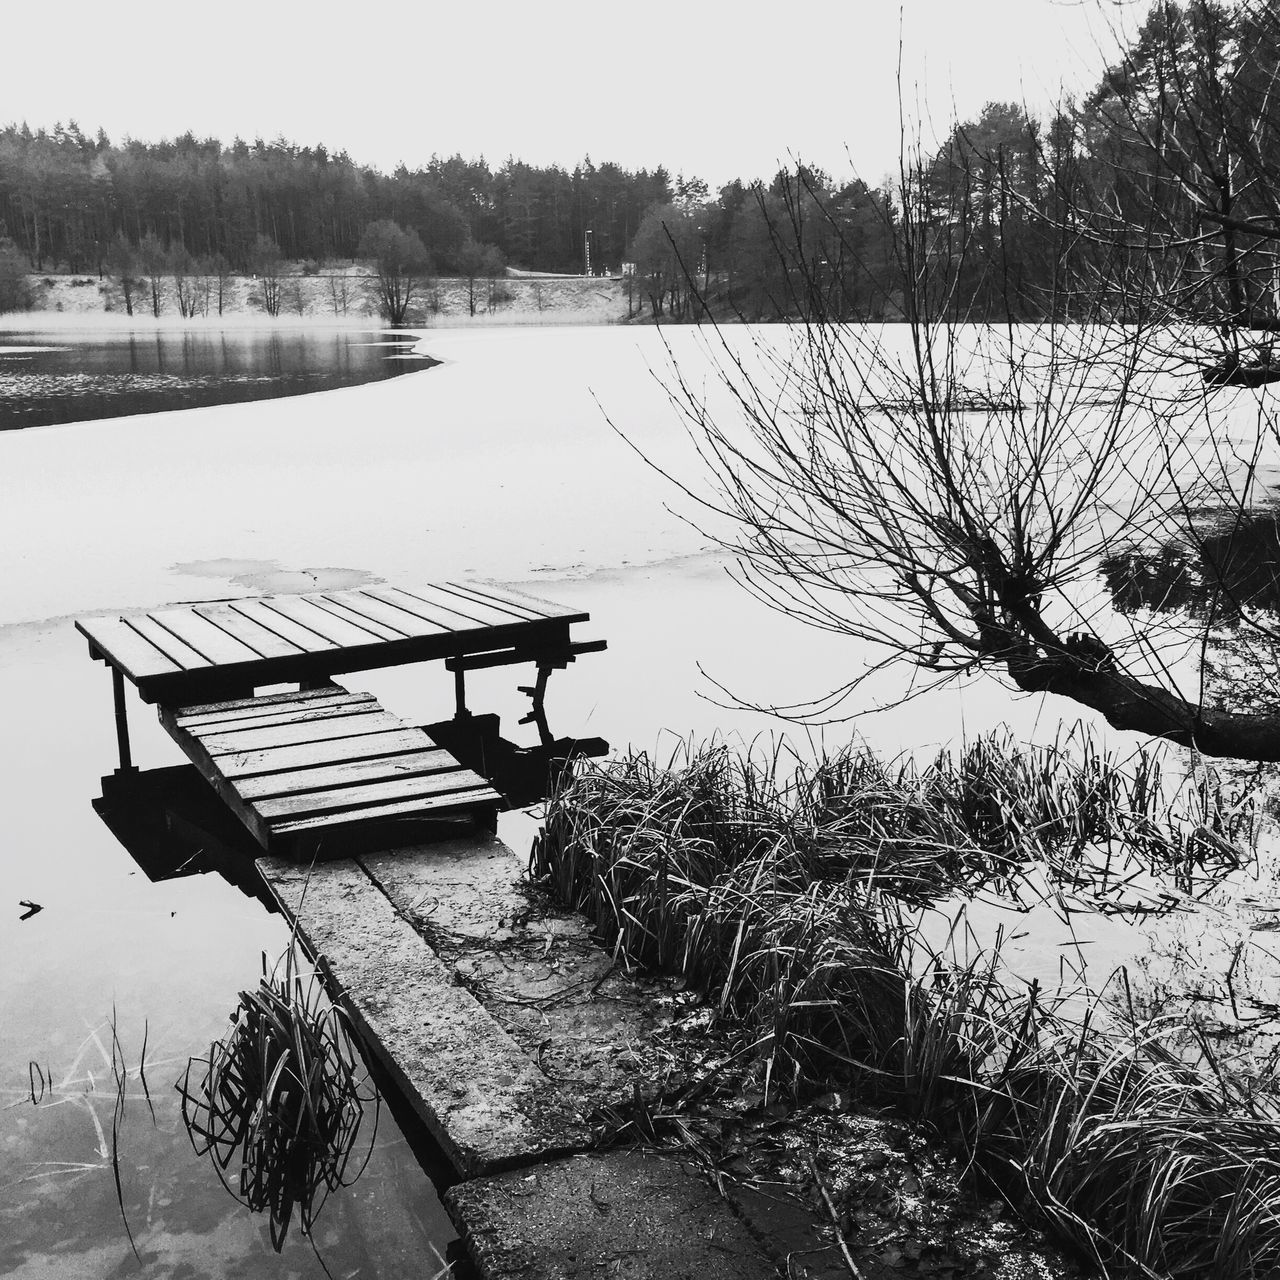 Landscape Landscape_Collection EyeEm Best Shots - Landscape IPSLandscape Nature_collection EyeEm Nature Lover Blackandwhite Black And White Black & White EyeEm Best Shots - Black + White